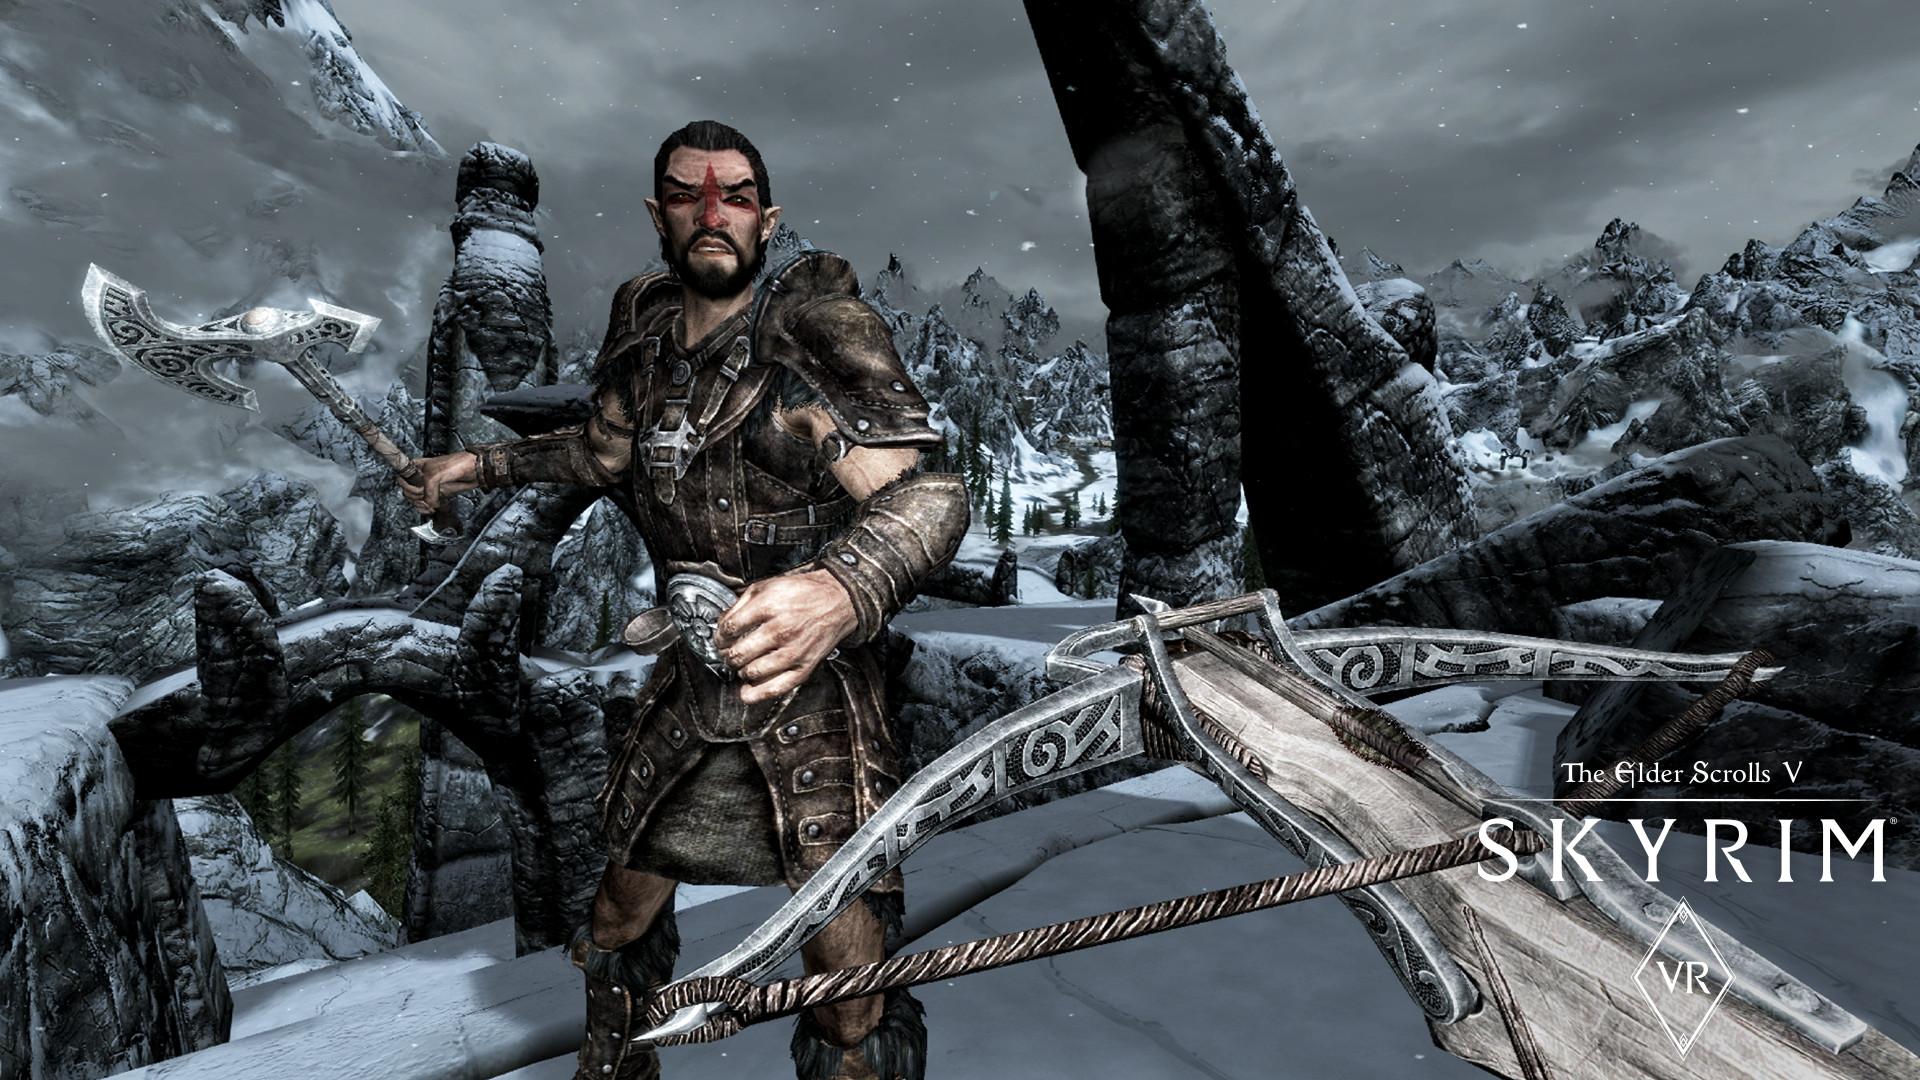 The Elder Scrolls V: Skyrim Special Edition Gaming Wallpaper for Walls